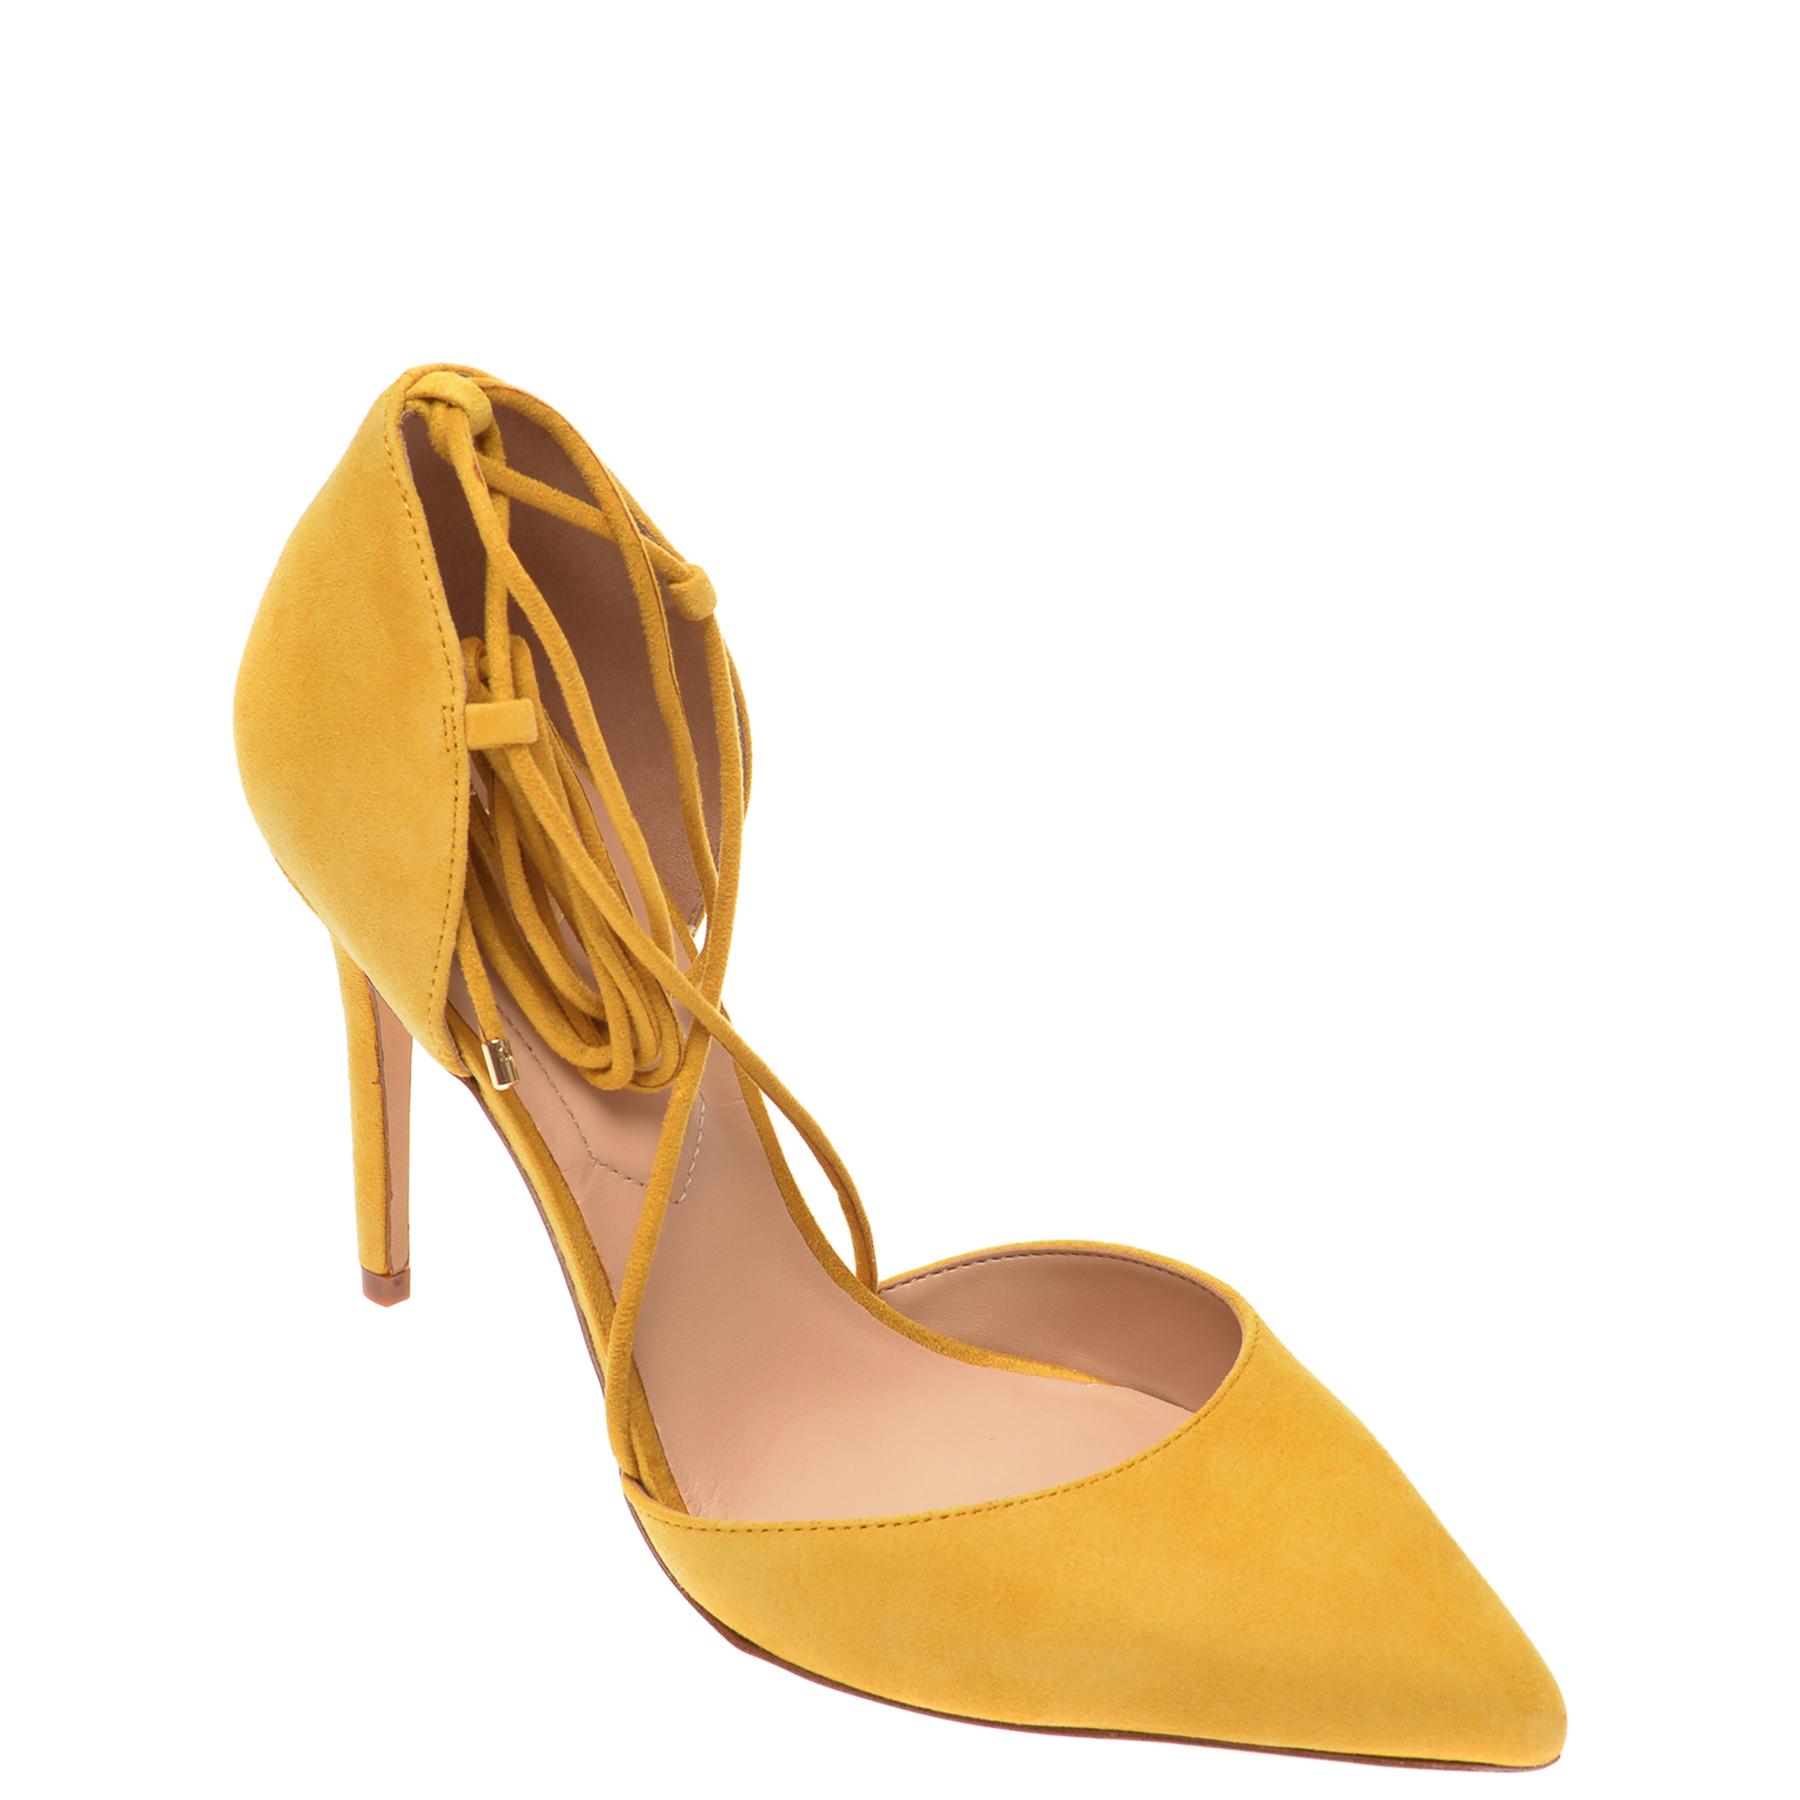 Pantofi ALDO galbeni, Finsbury730, din piele intoarsa New